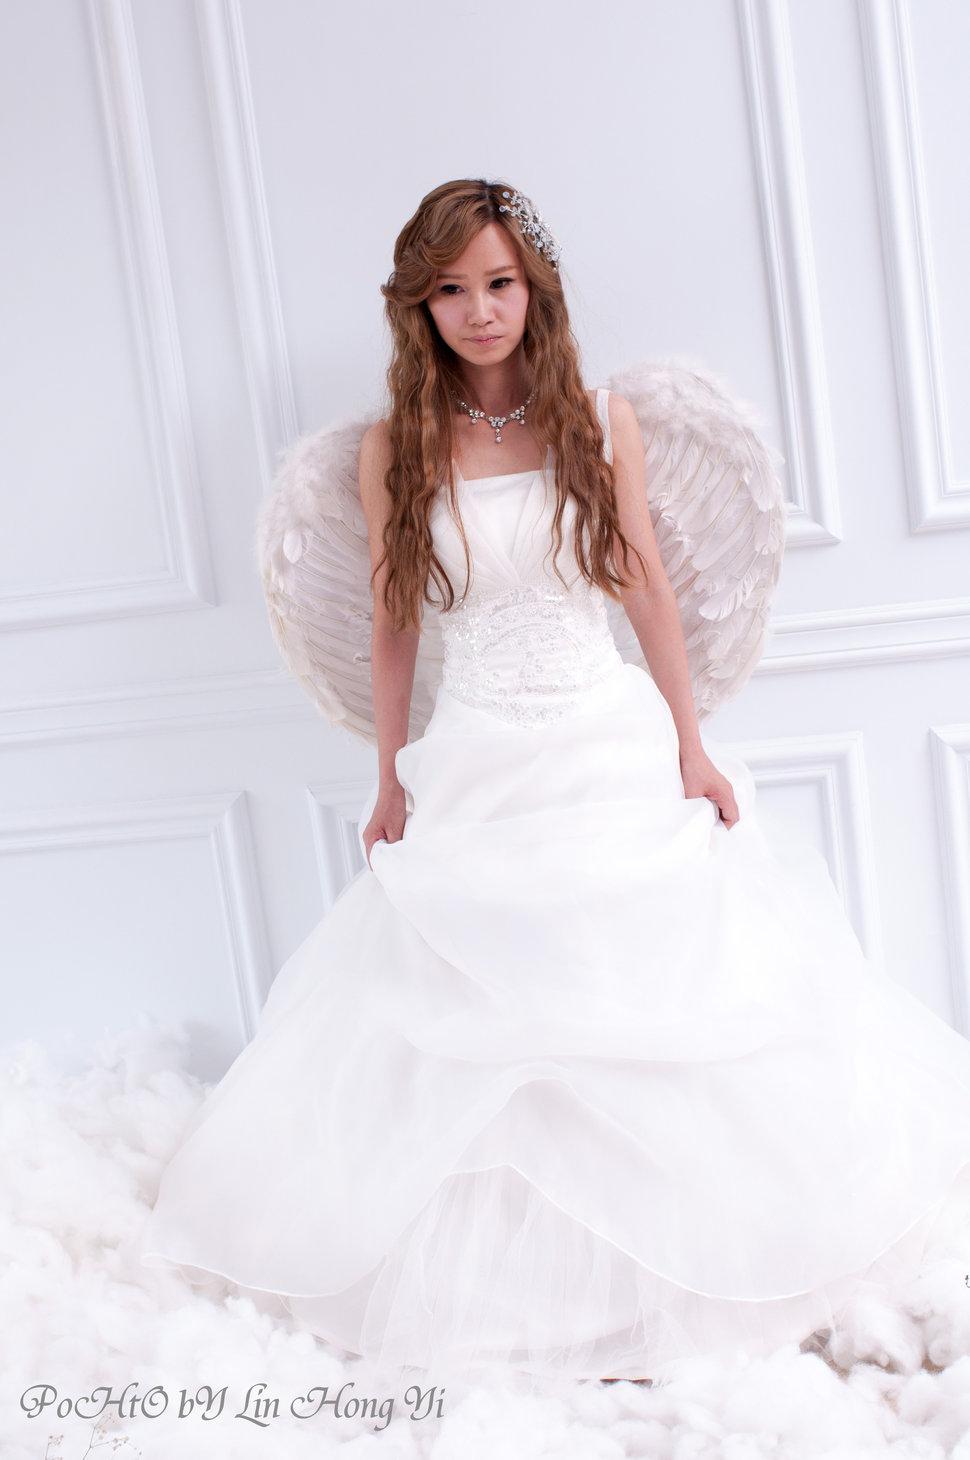 DSC_1294 - 小林哥Hung YI攝影工作室《結婚吧》